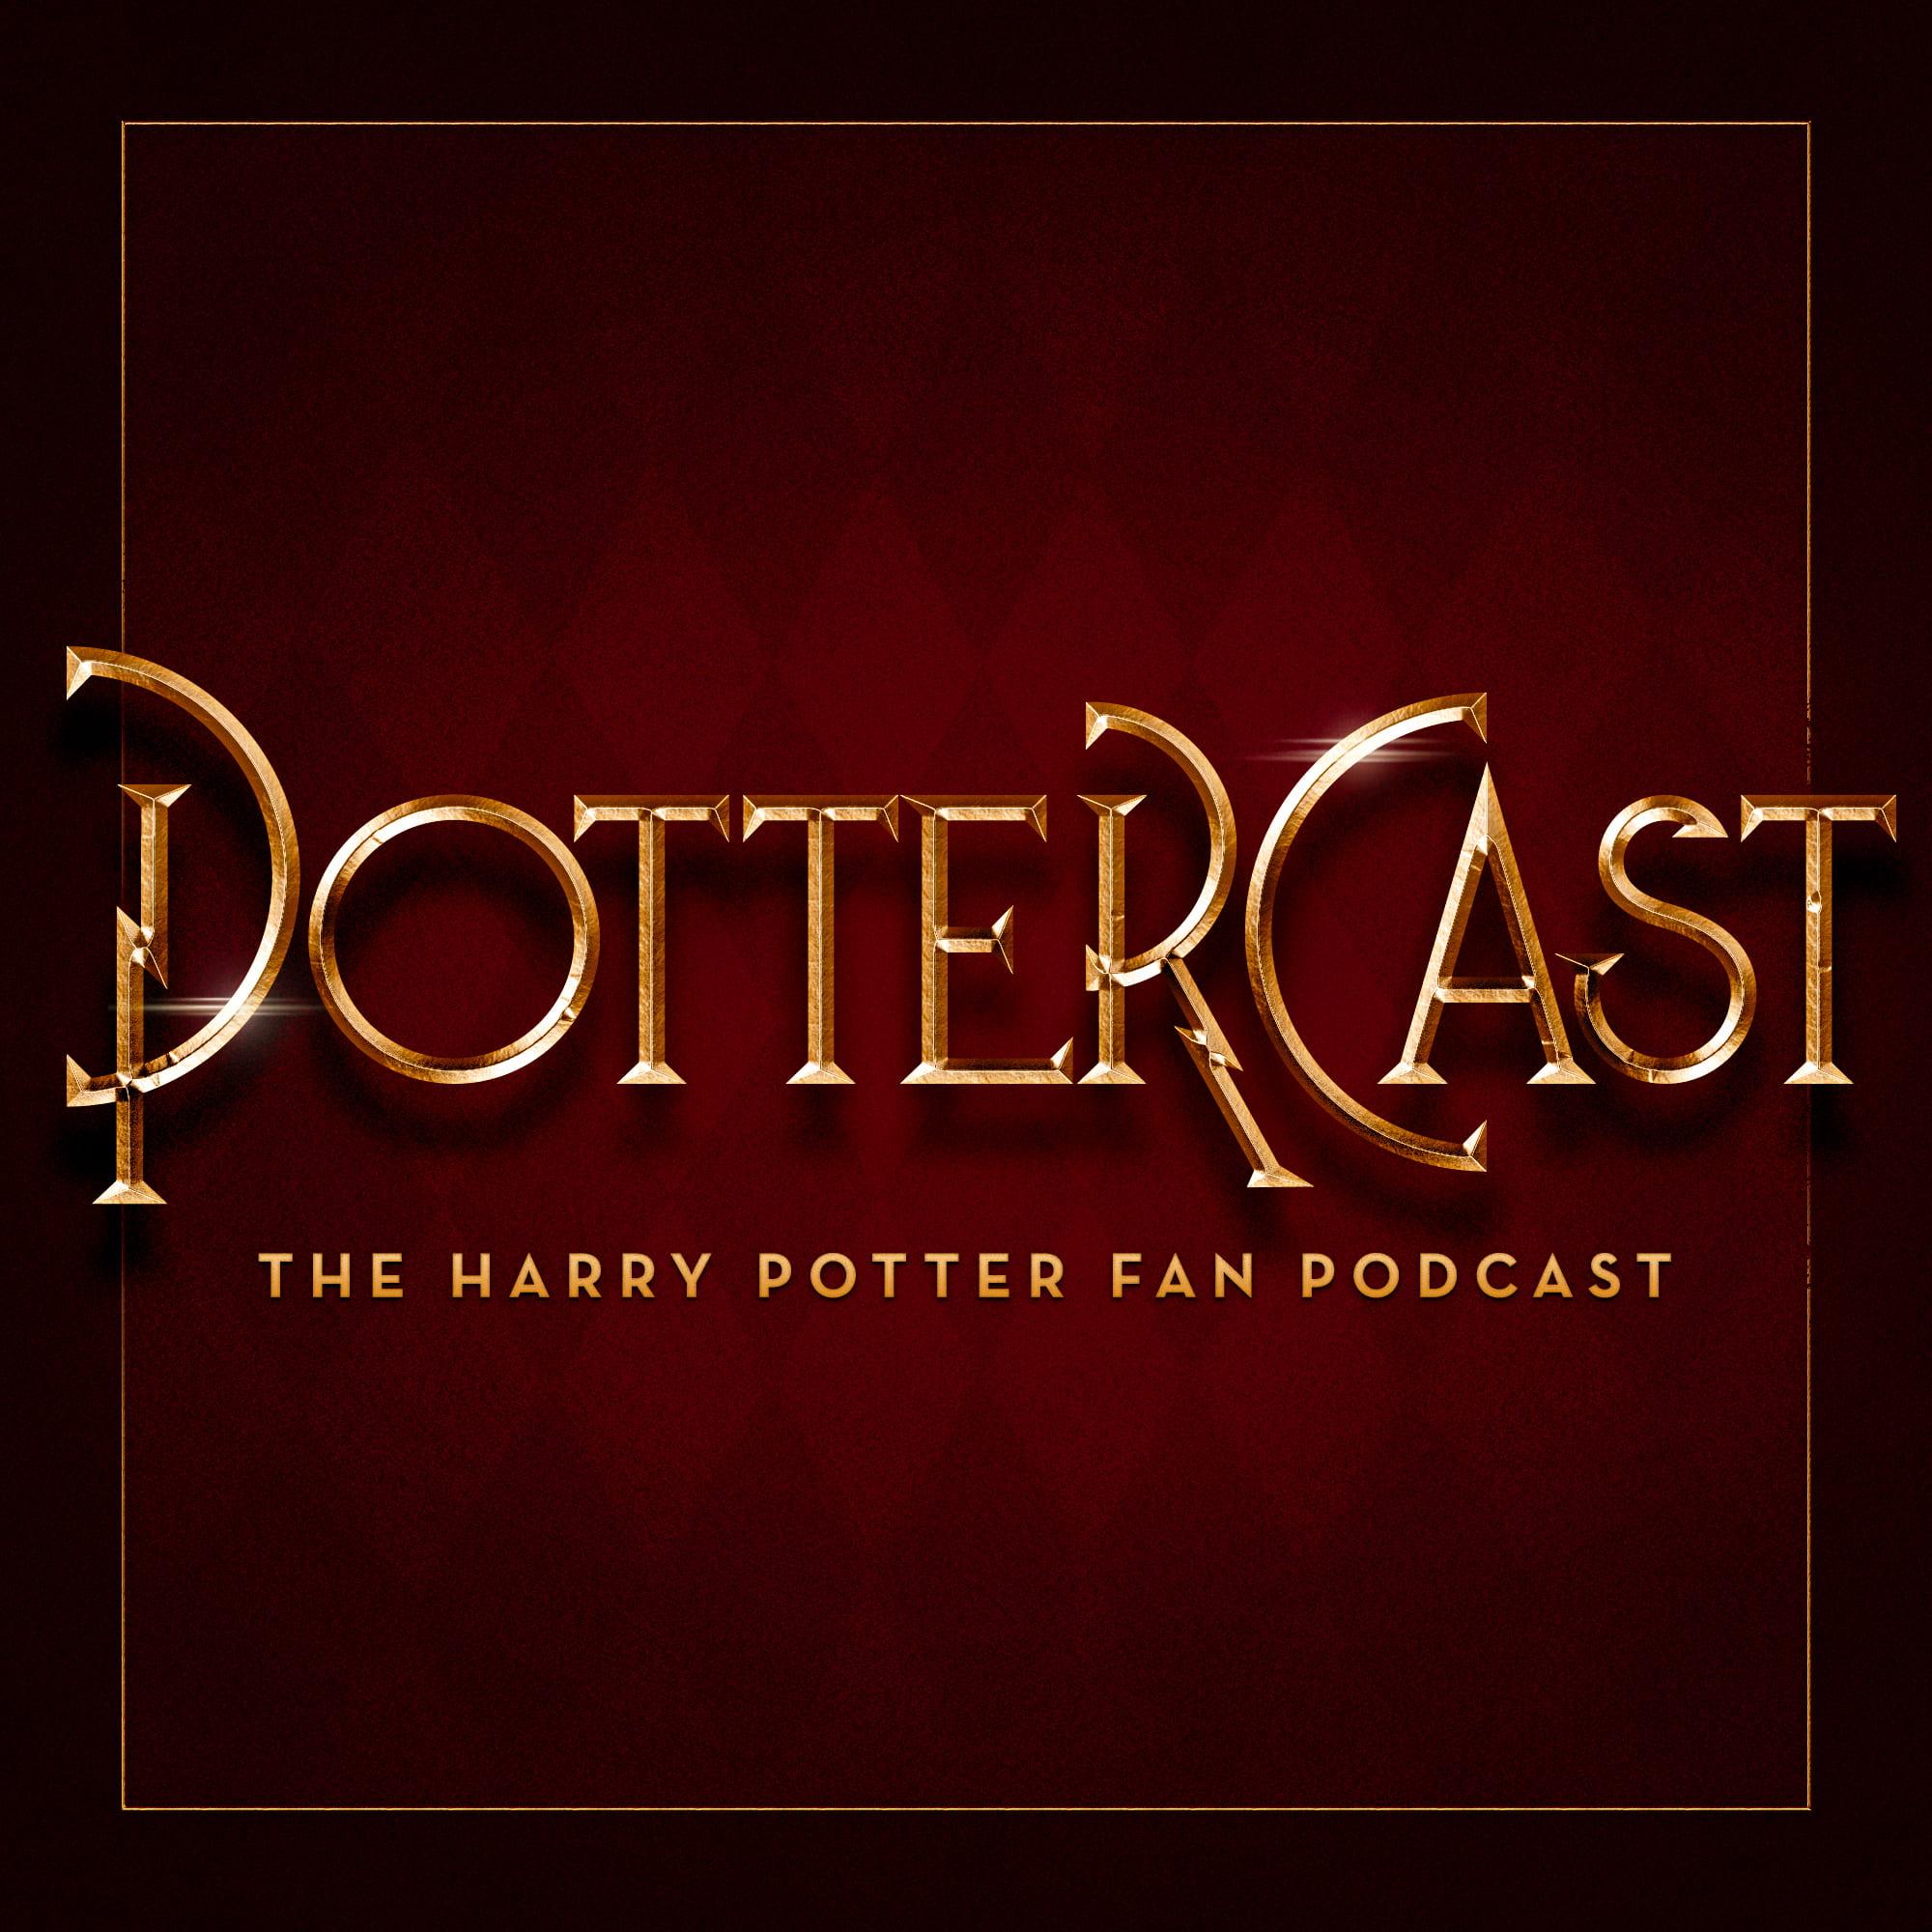 30061cf7a45232 PotterCast - The Harry Potter Podcast -  278  LeakyNews!